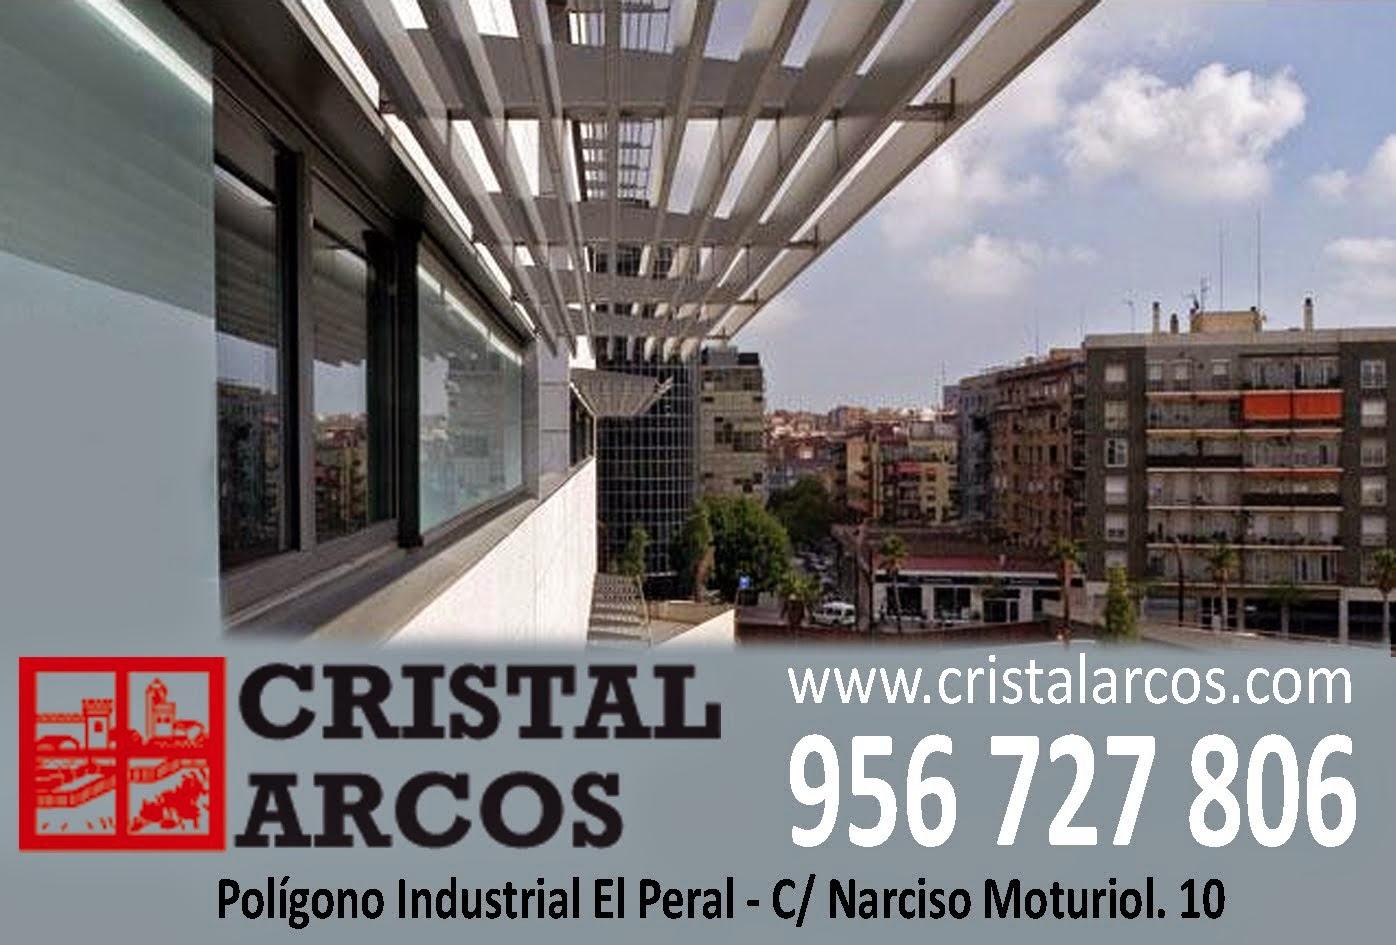 Cristal Arcos